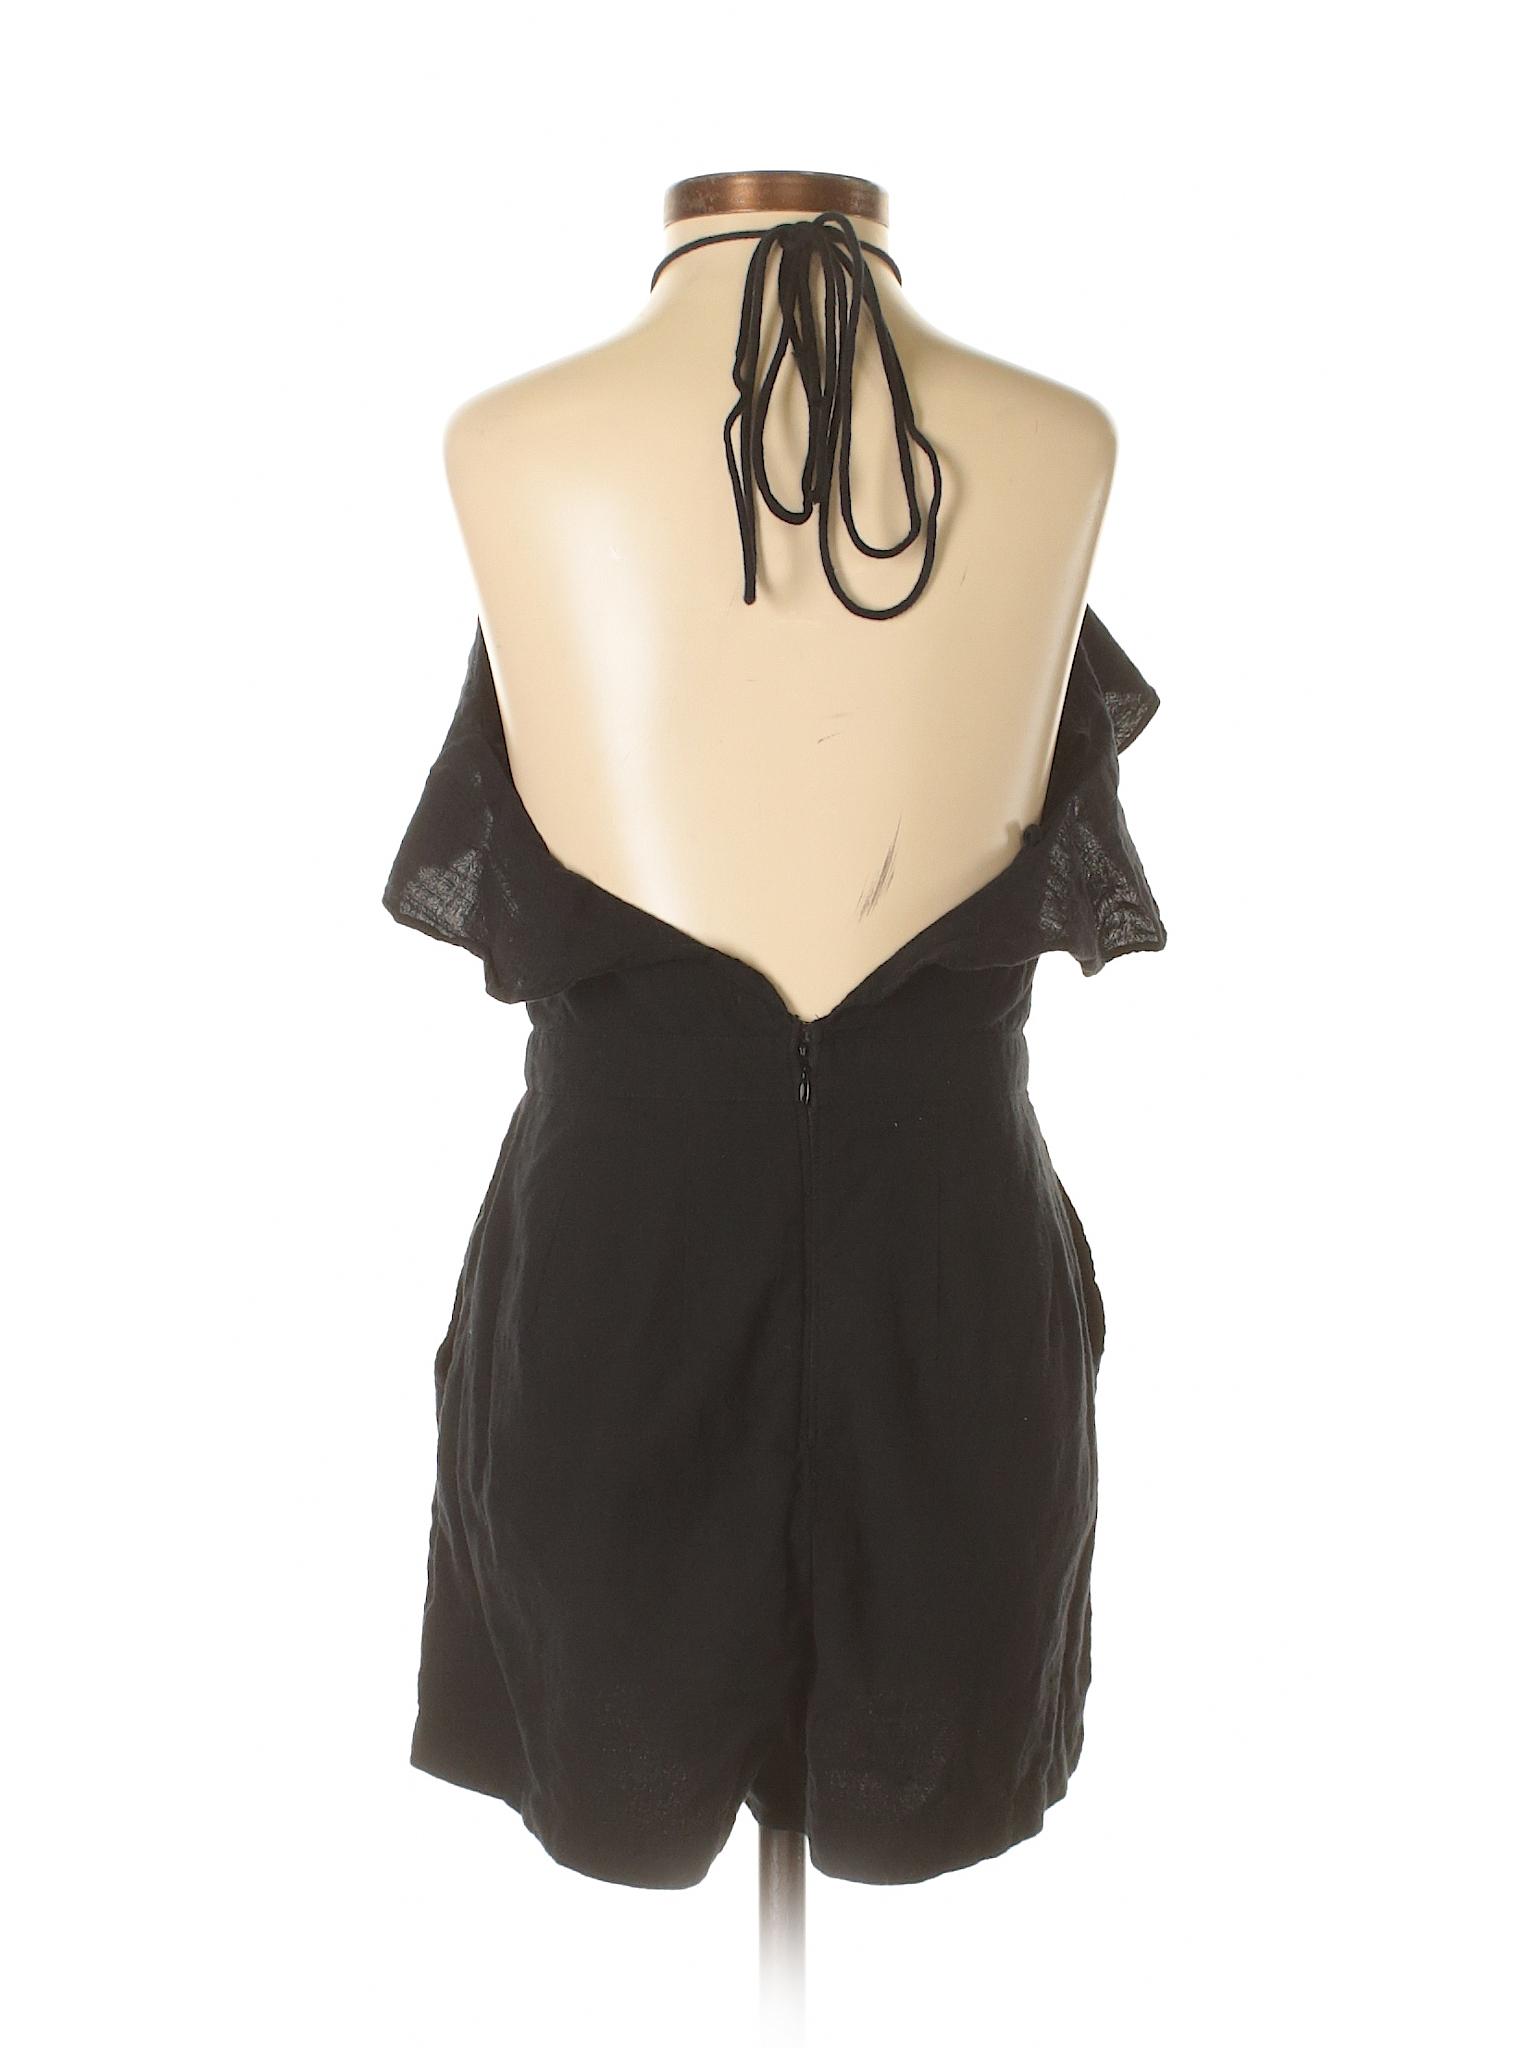 075932ac5d9 Abercrombie   Fitch 100% Cotton Solid Black Romper Size 2 (Petite) - 63%  off